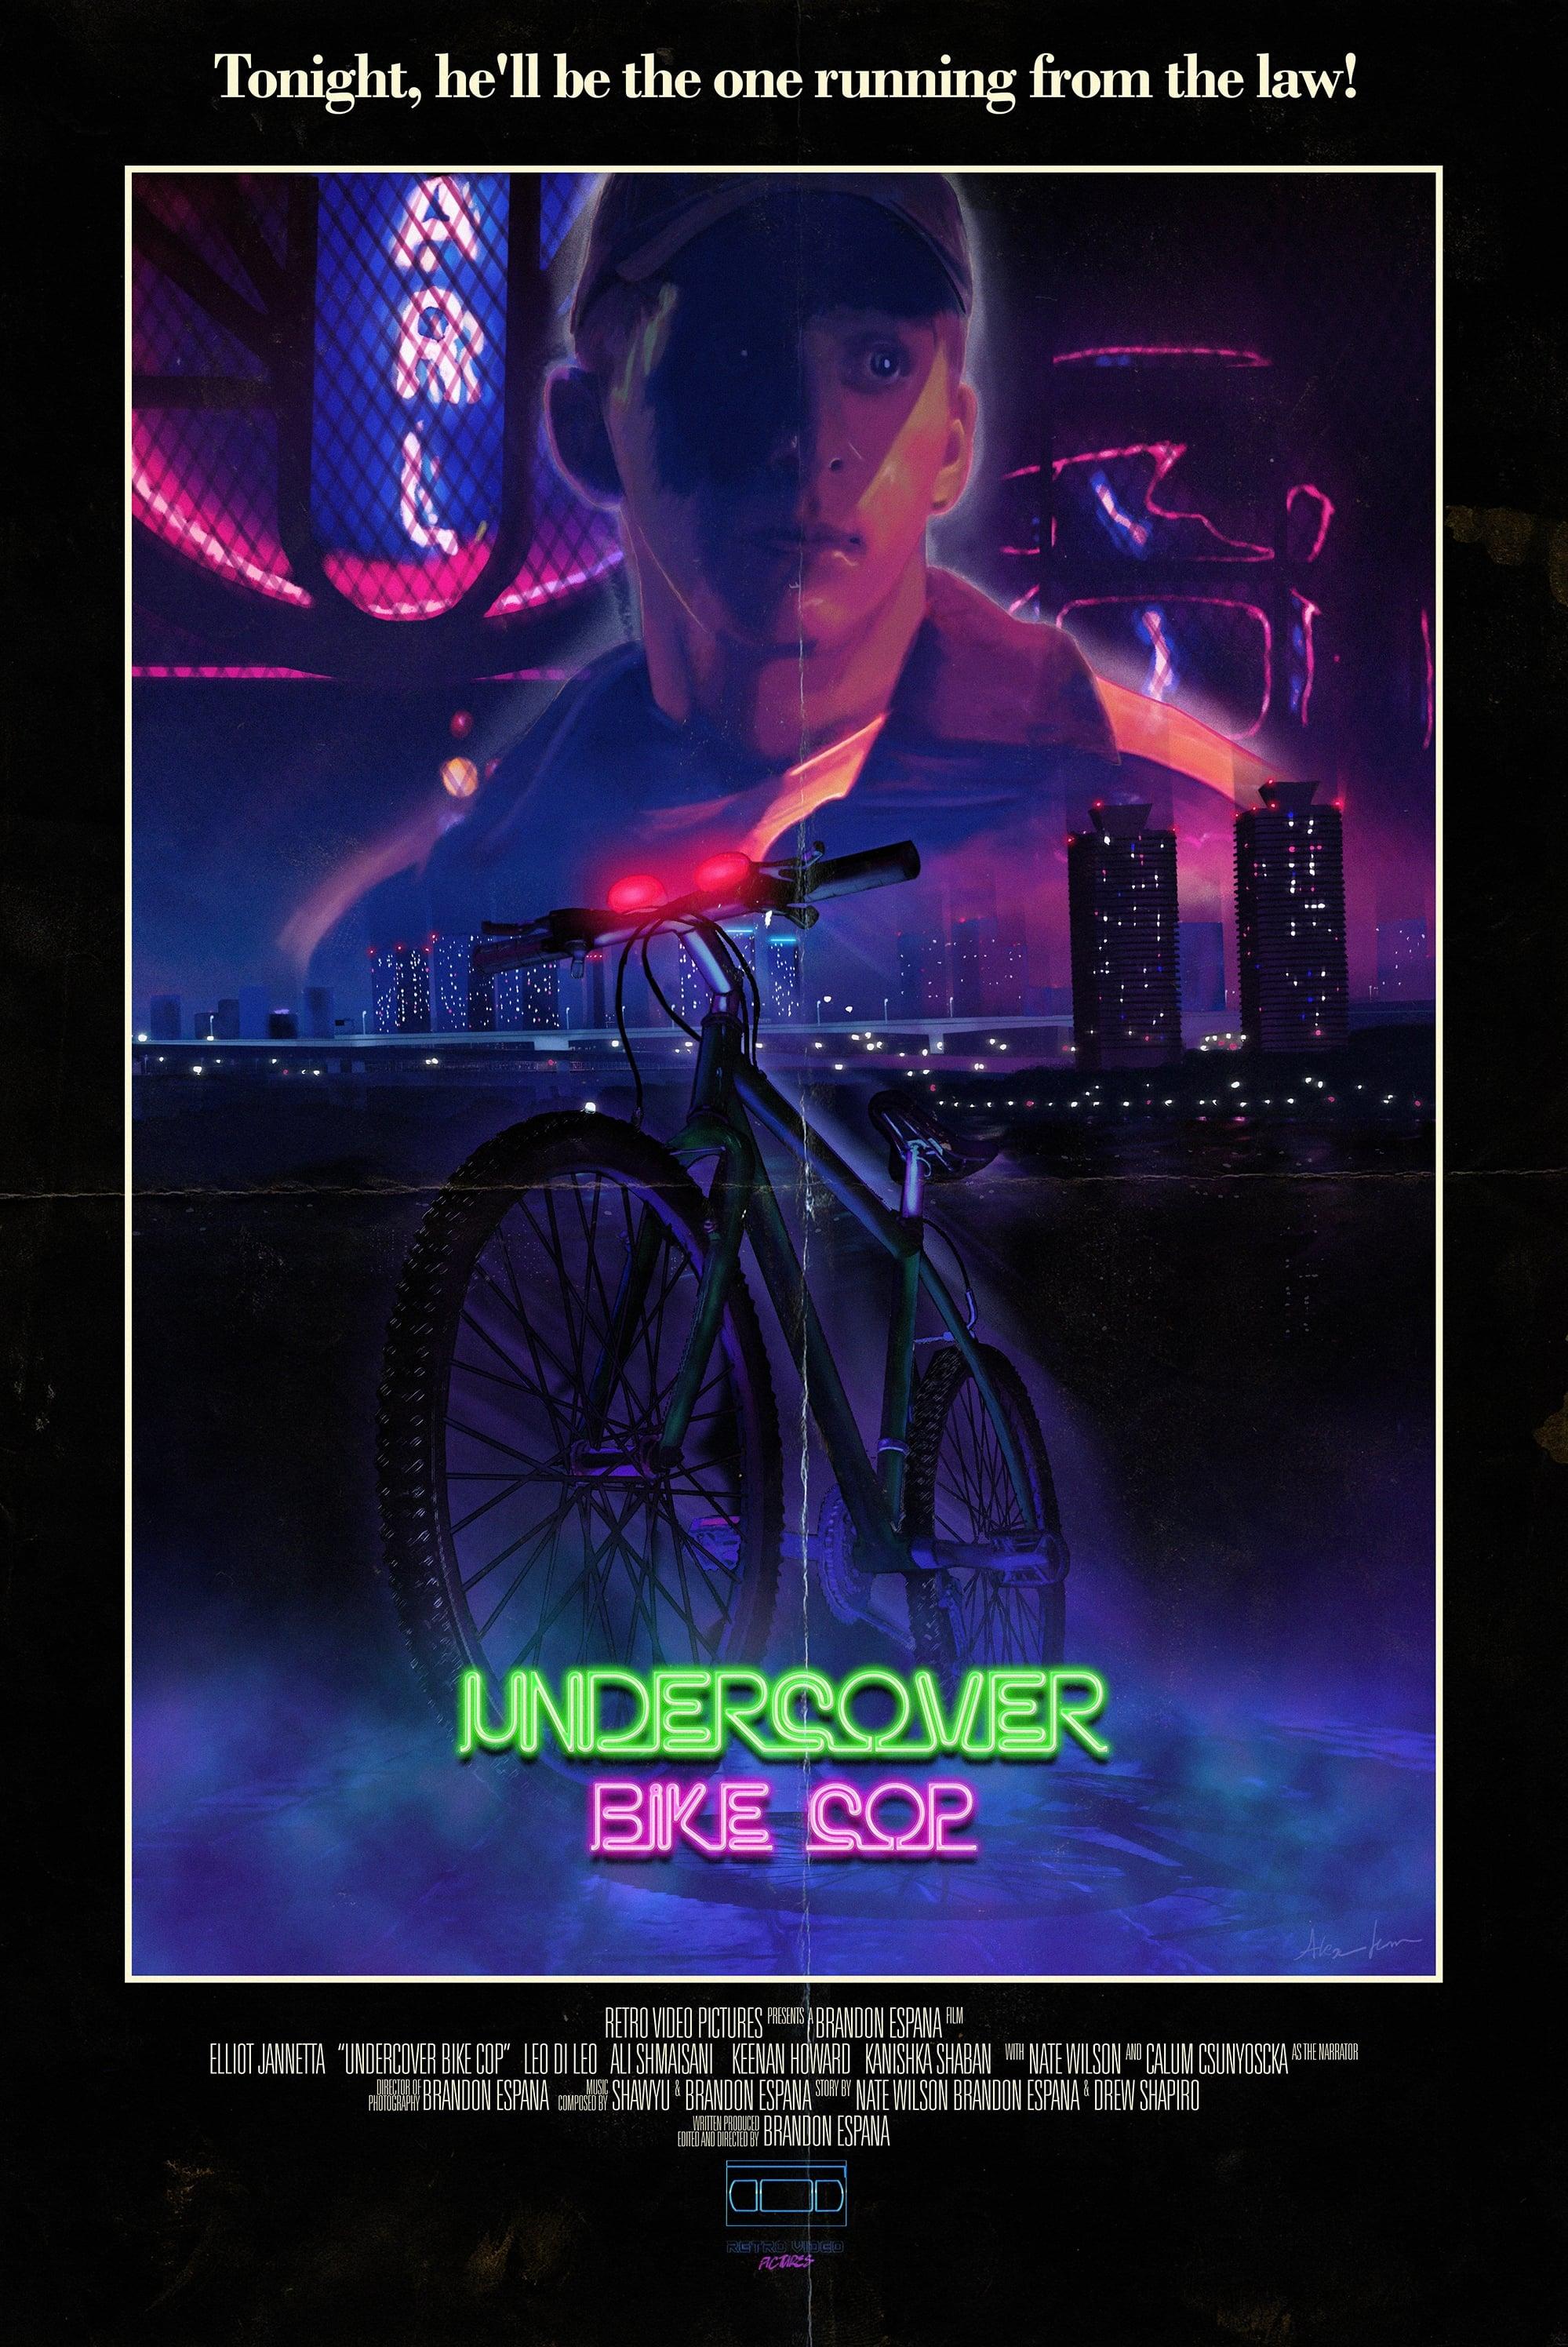 Undercover Bike Cop